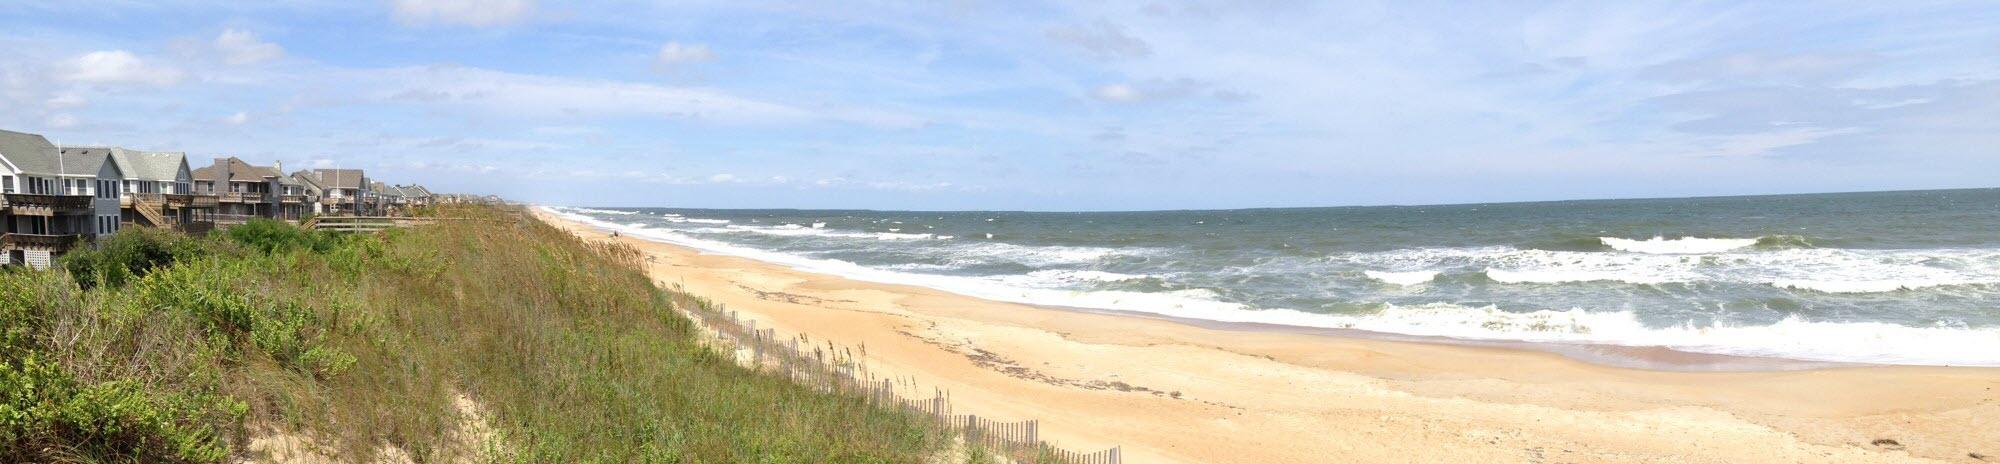 Dunes-and-Beach-Duck-NC